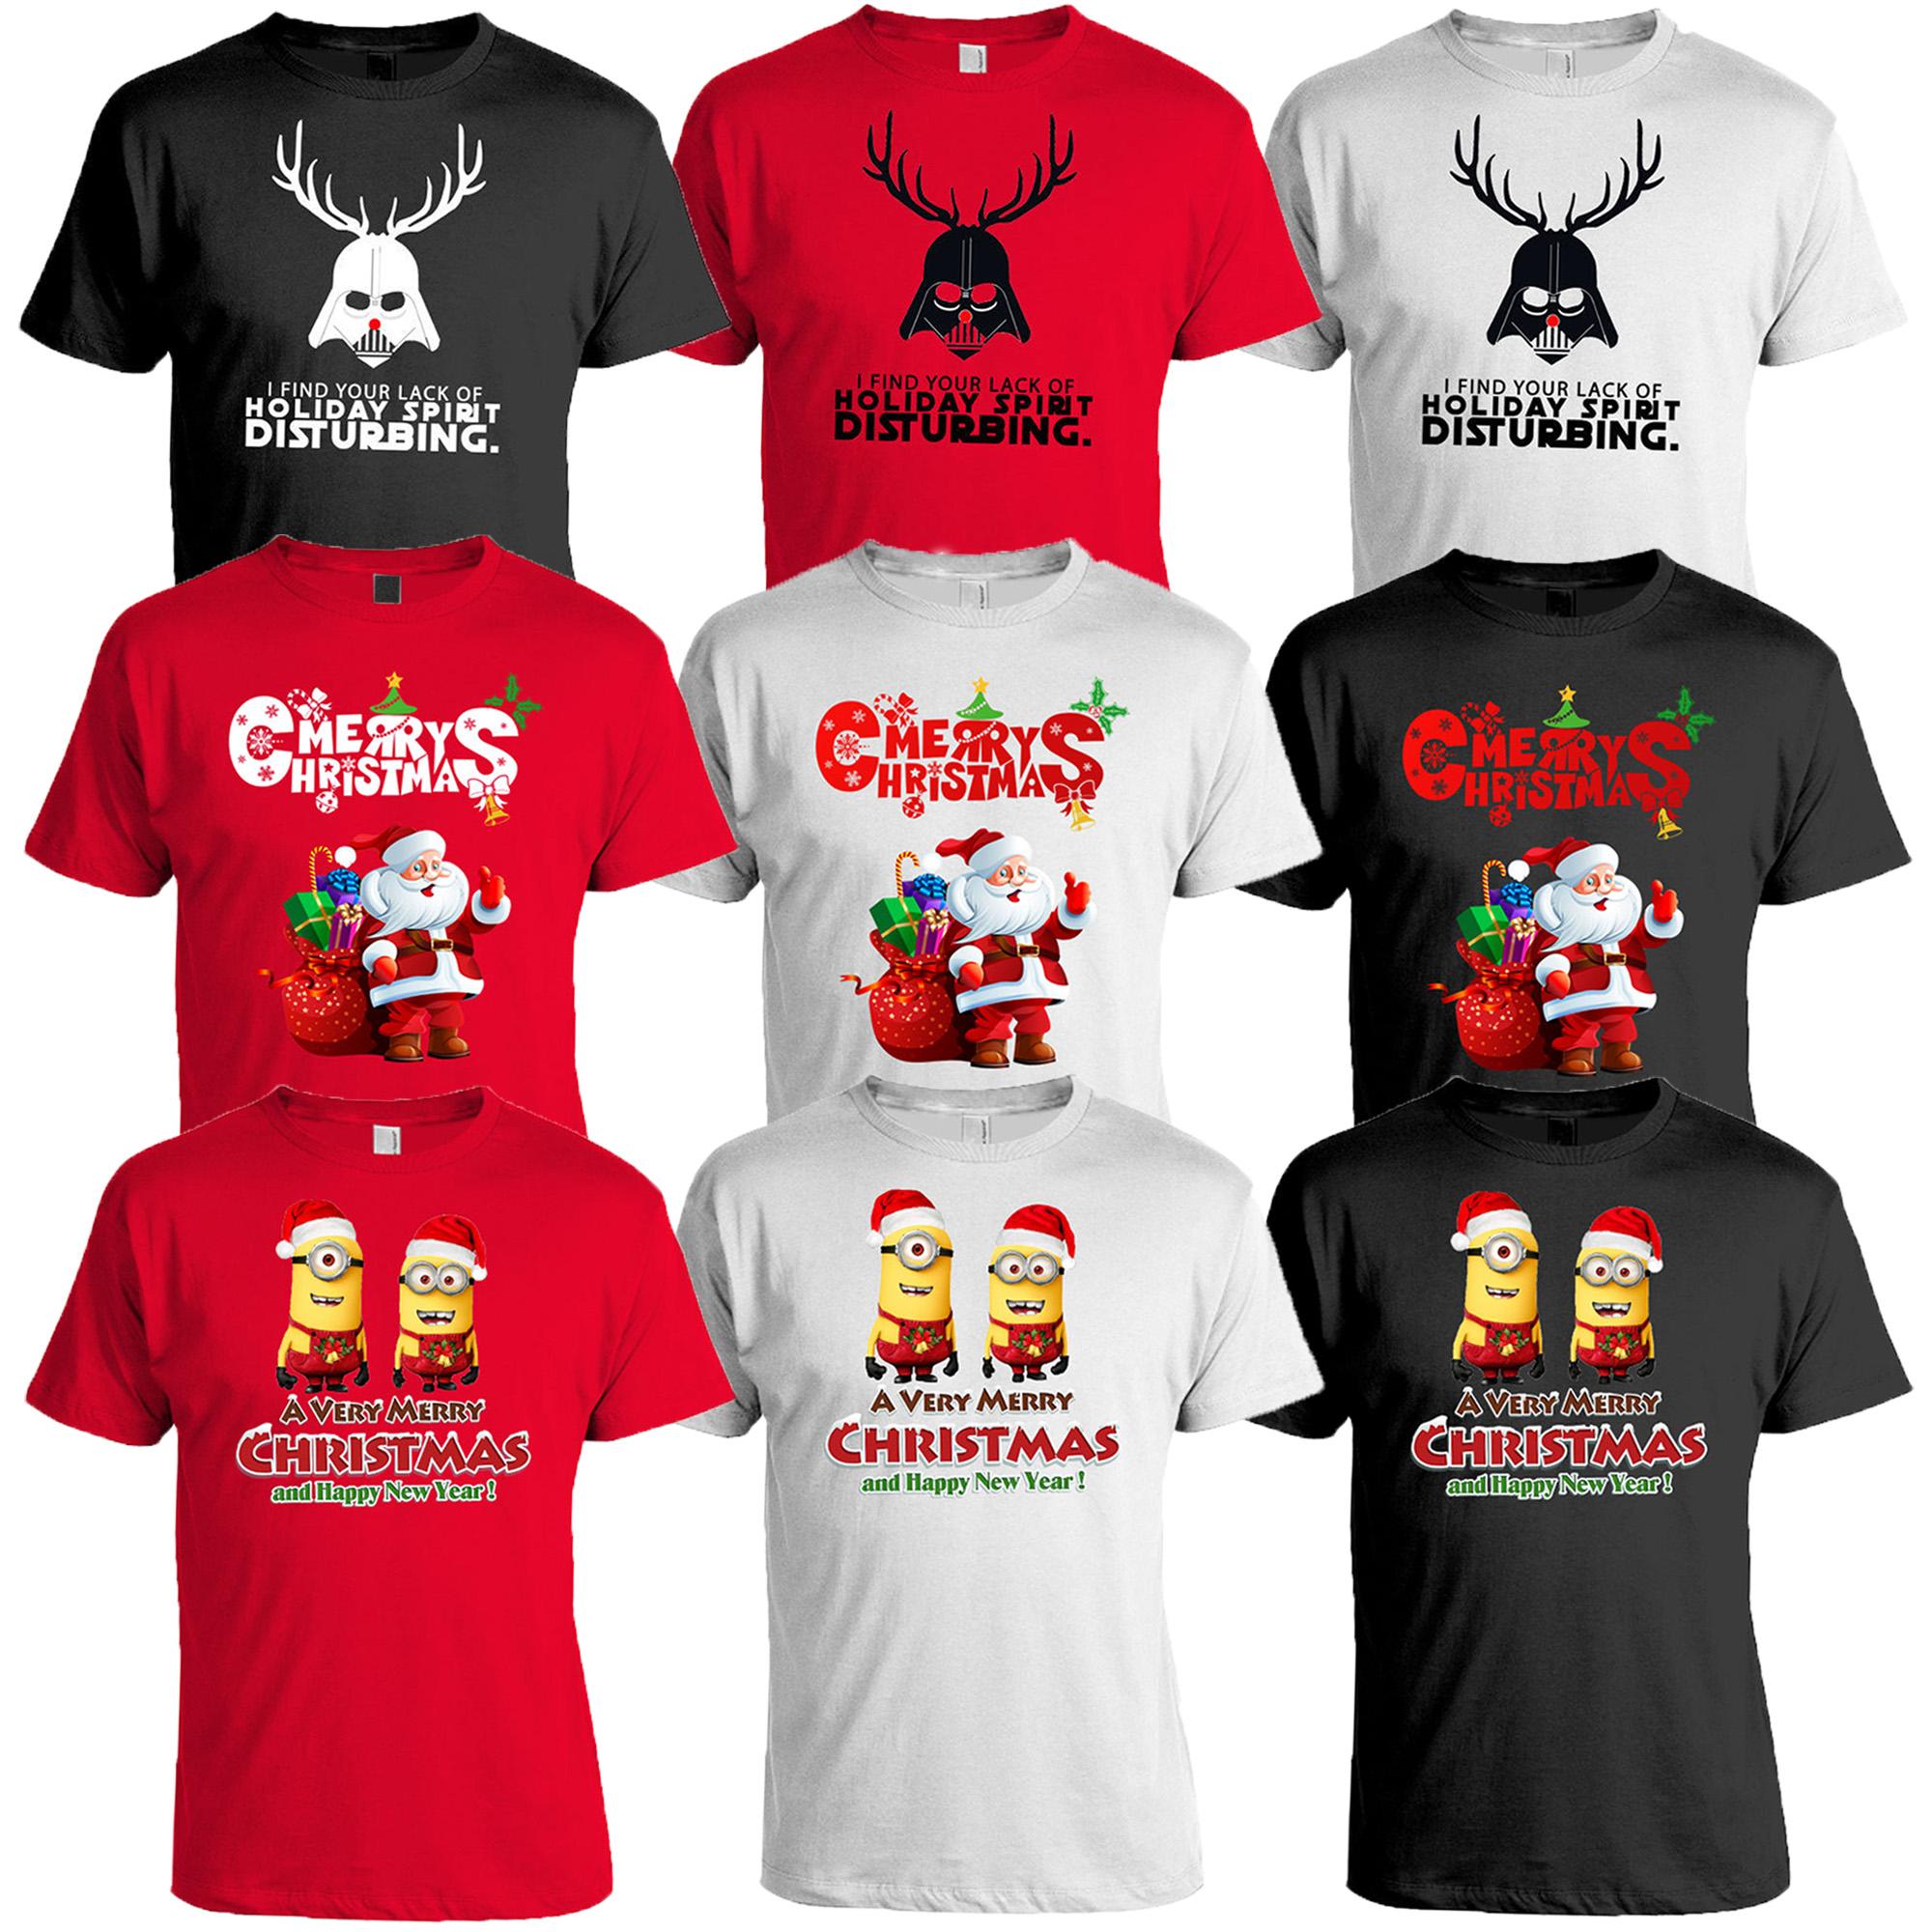 af4ce9b01382 Details about Mens Christmas T Shirt Xmas MINIONS DARTH VADER Santa Claus  Print Novelty Cotton